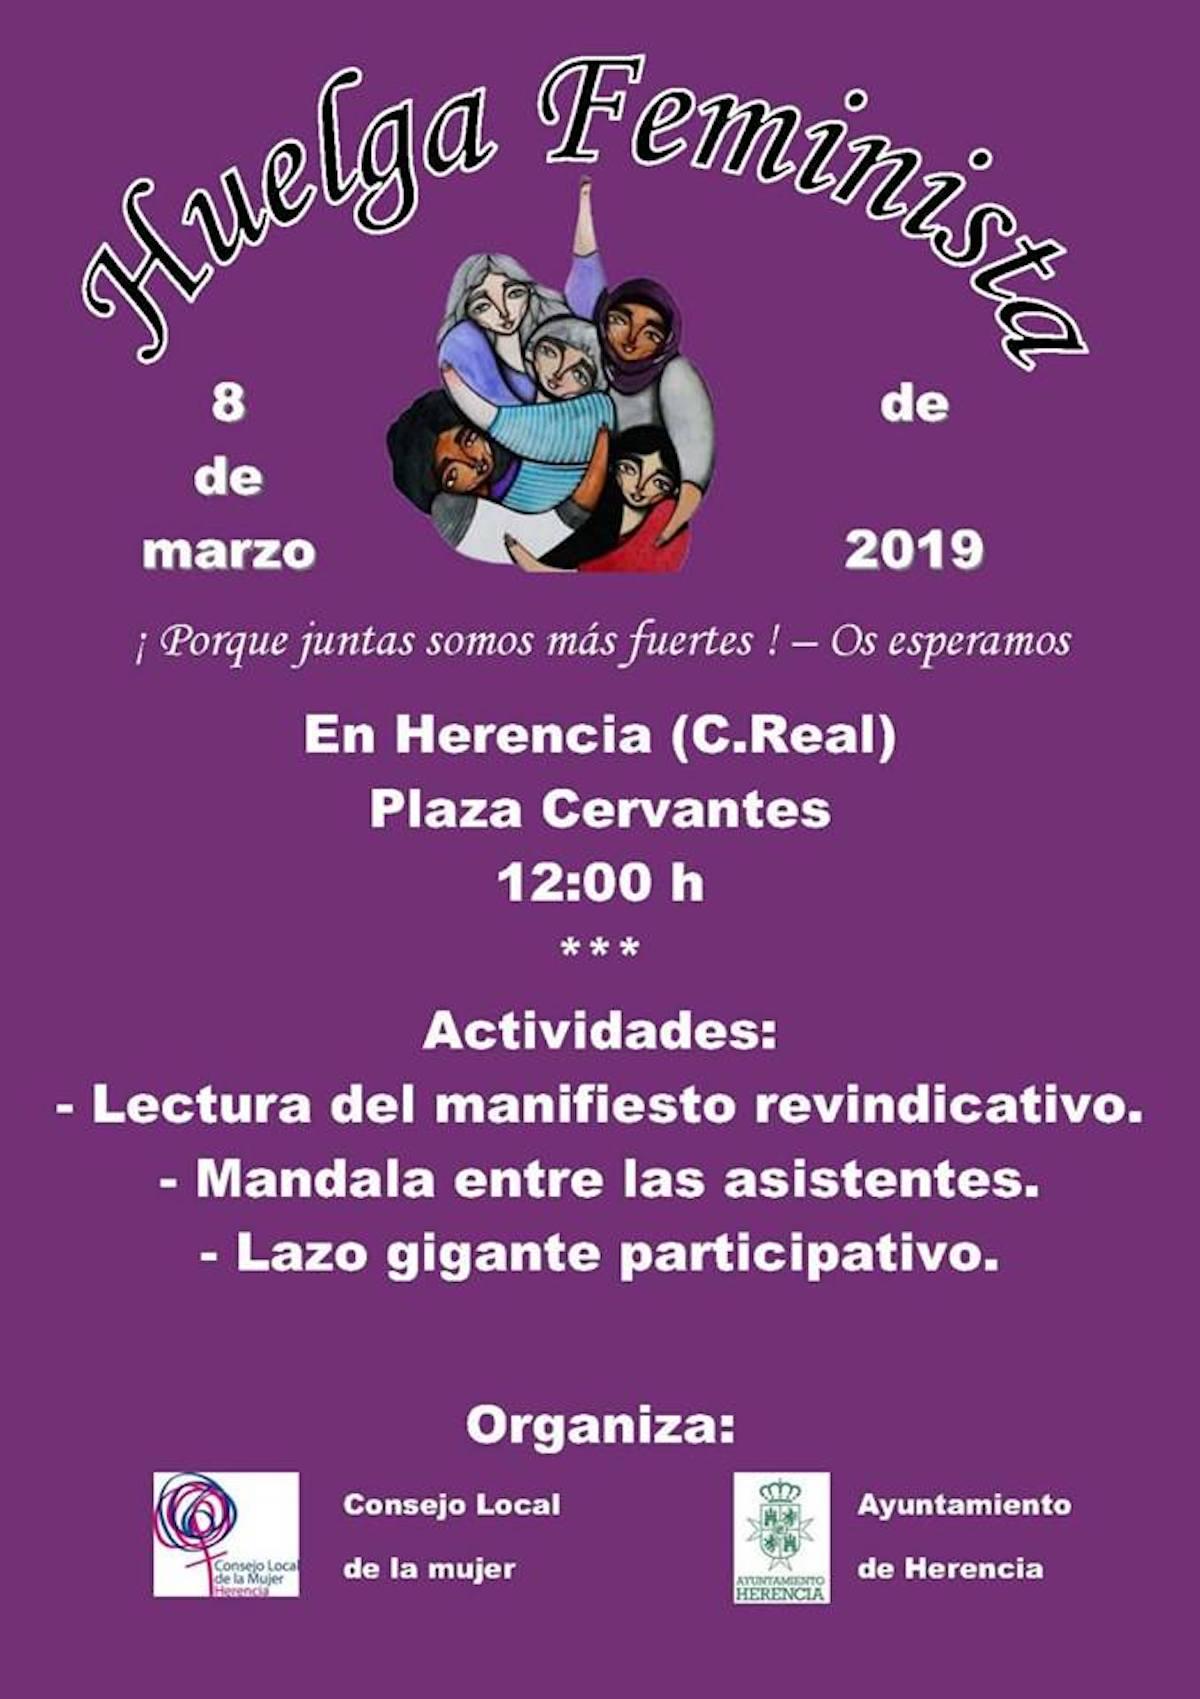 huelga feminista herencia 2019 - Huelga Feminista el 8 de marzo en Herencia